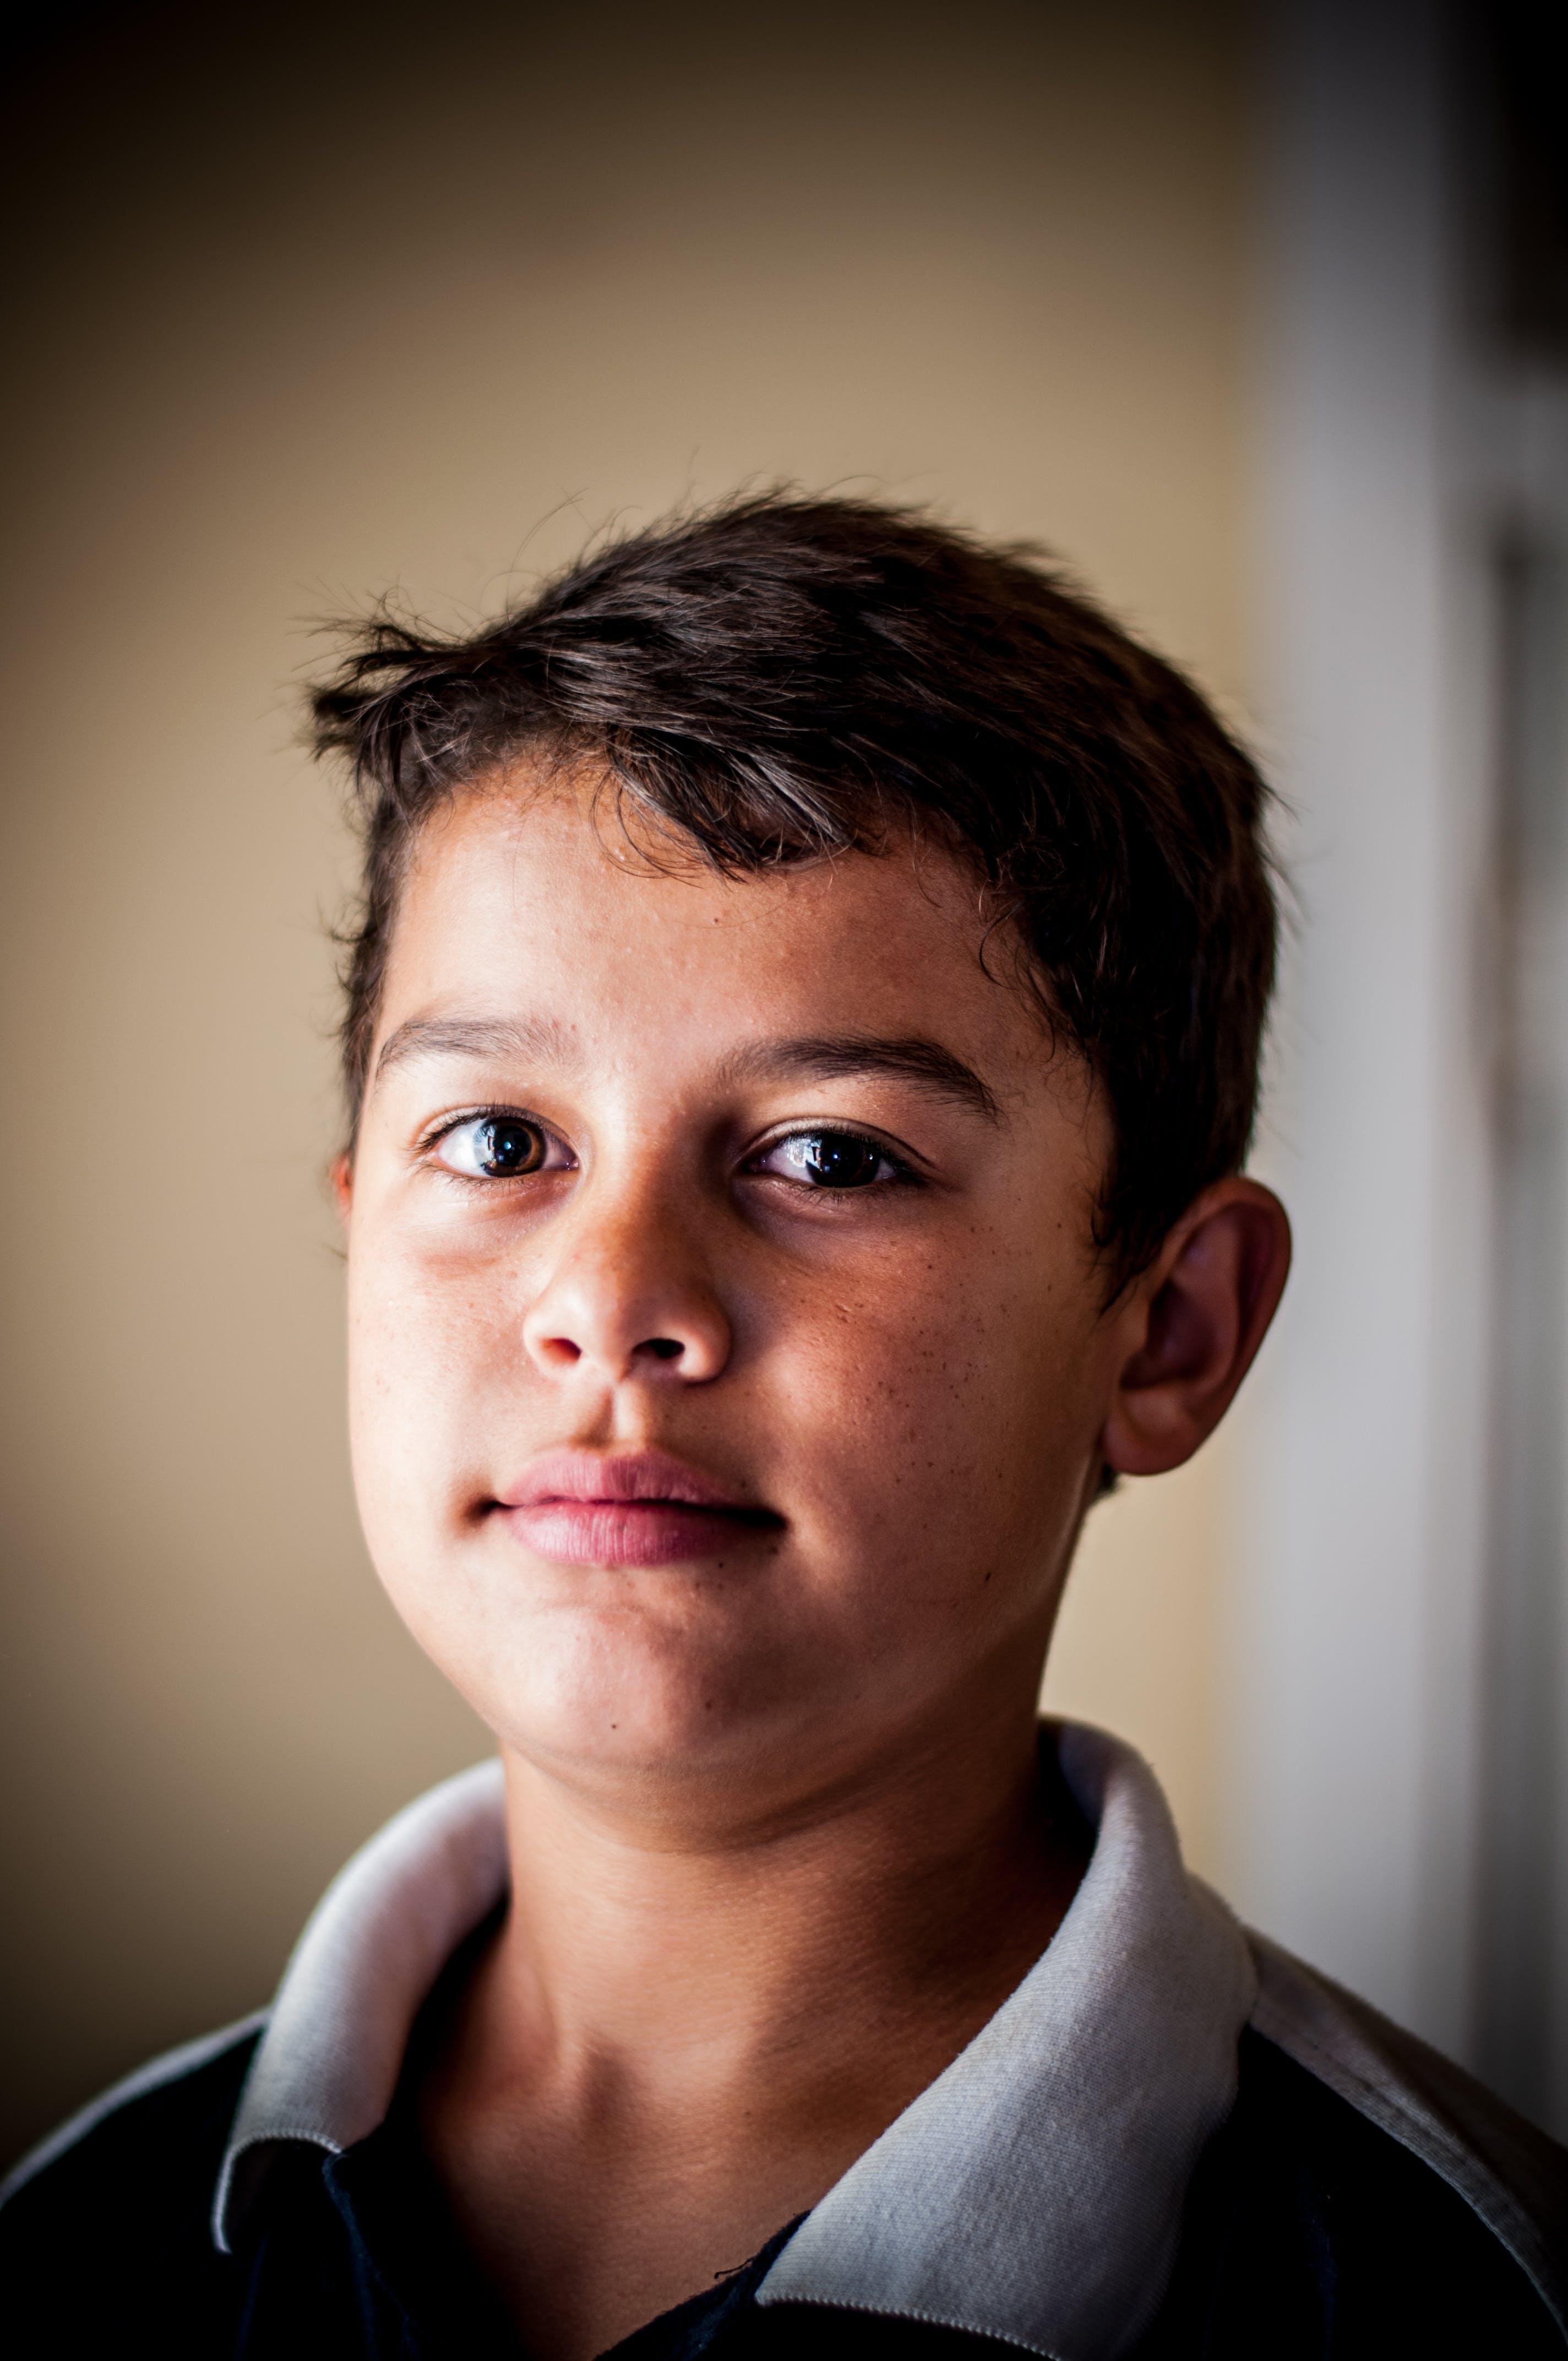 Free stock photo of portrait, boy, young boy